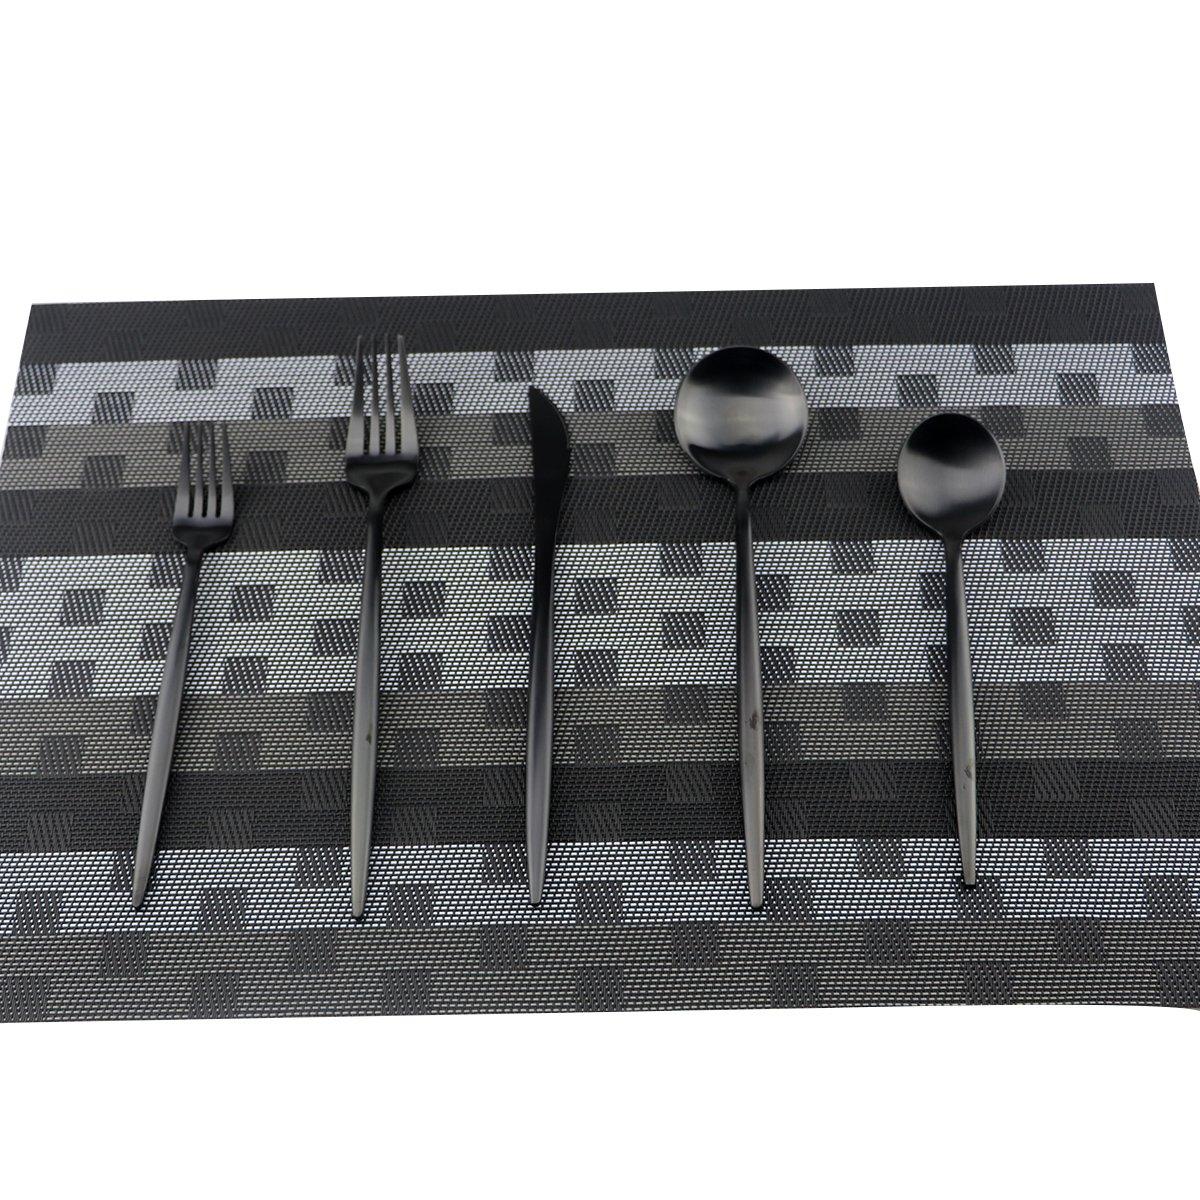 Uniturcky Flatware Set 18/10 Stainless Steel Matte Black - Kitchen Utensil Serving Set of Dinner Fork Knife Spoon Salad Fork Dessert Spoon,20 Piece Set of 4, for Home Kitchen Restaurant Hotel